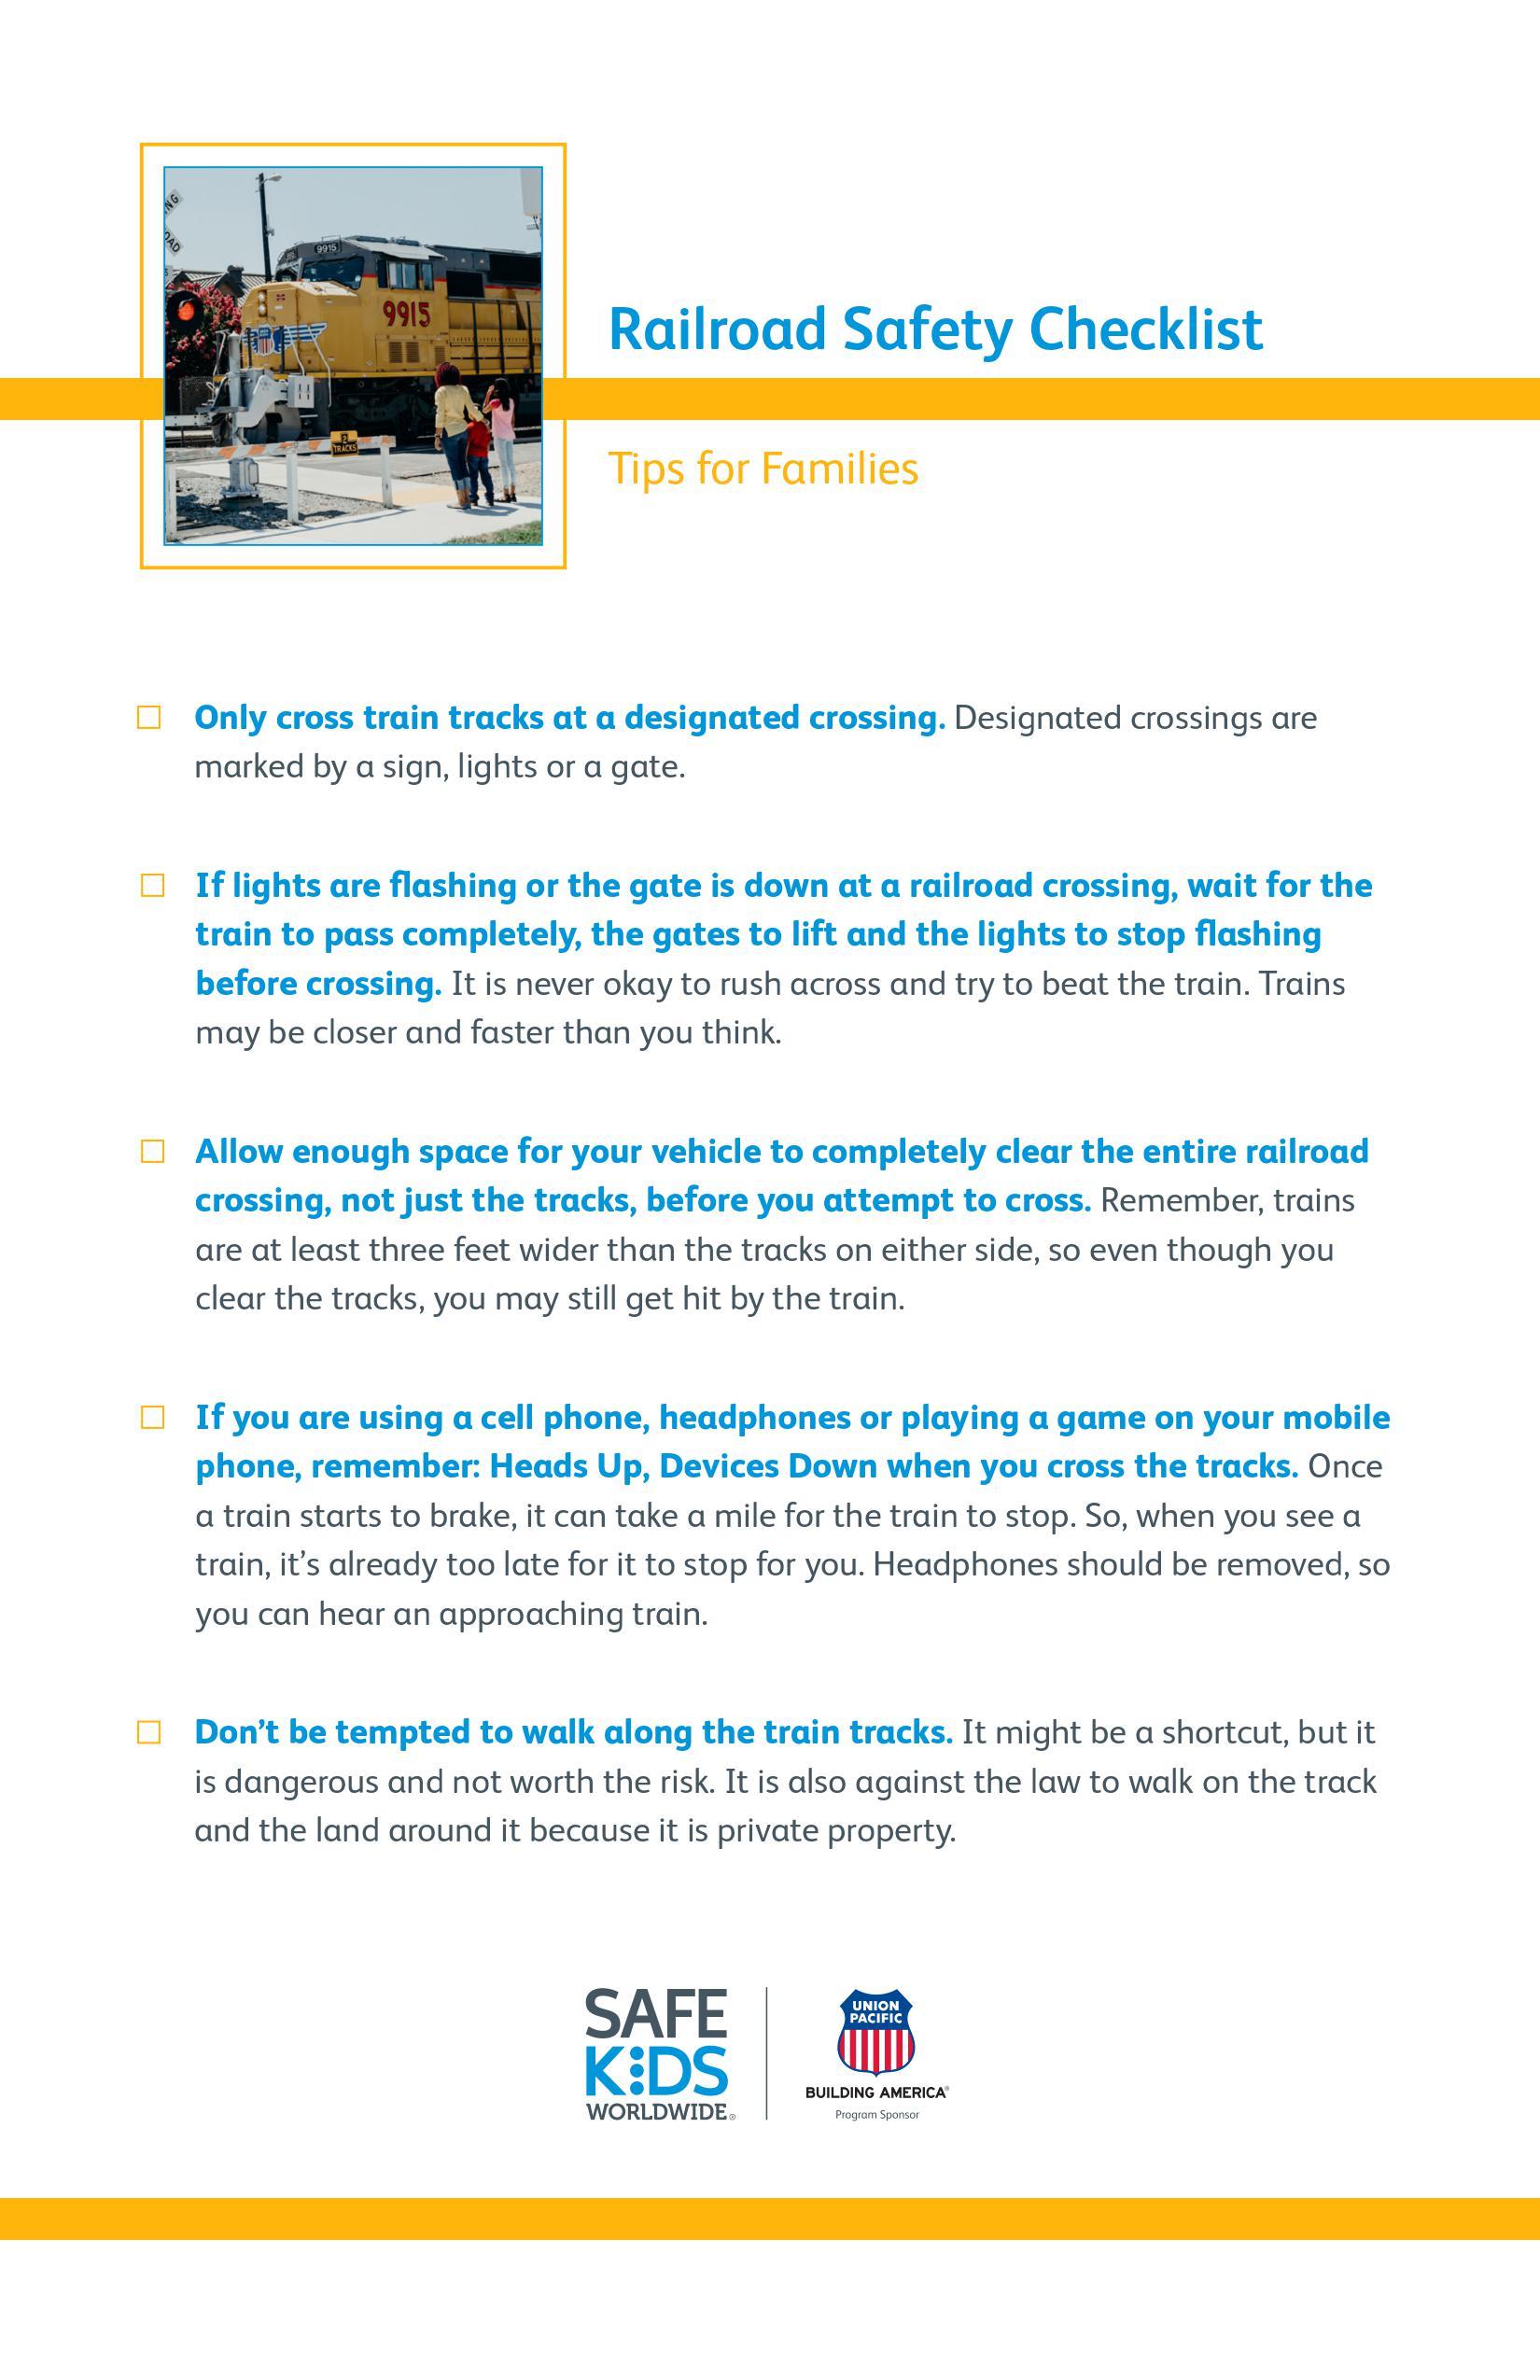 Railroad Safety Checklist